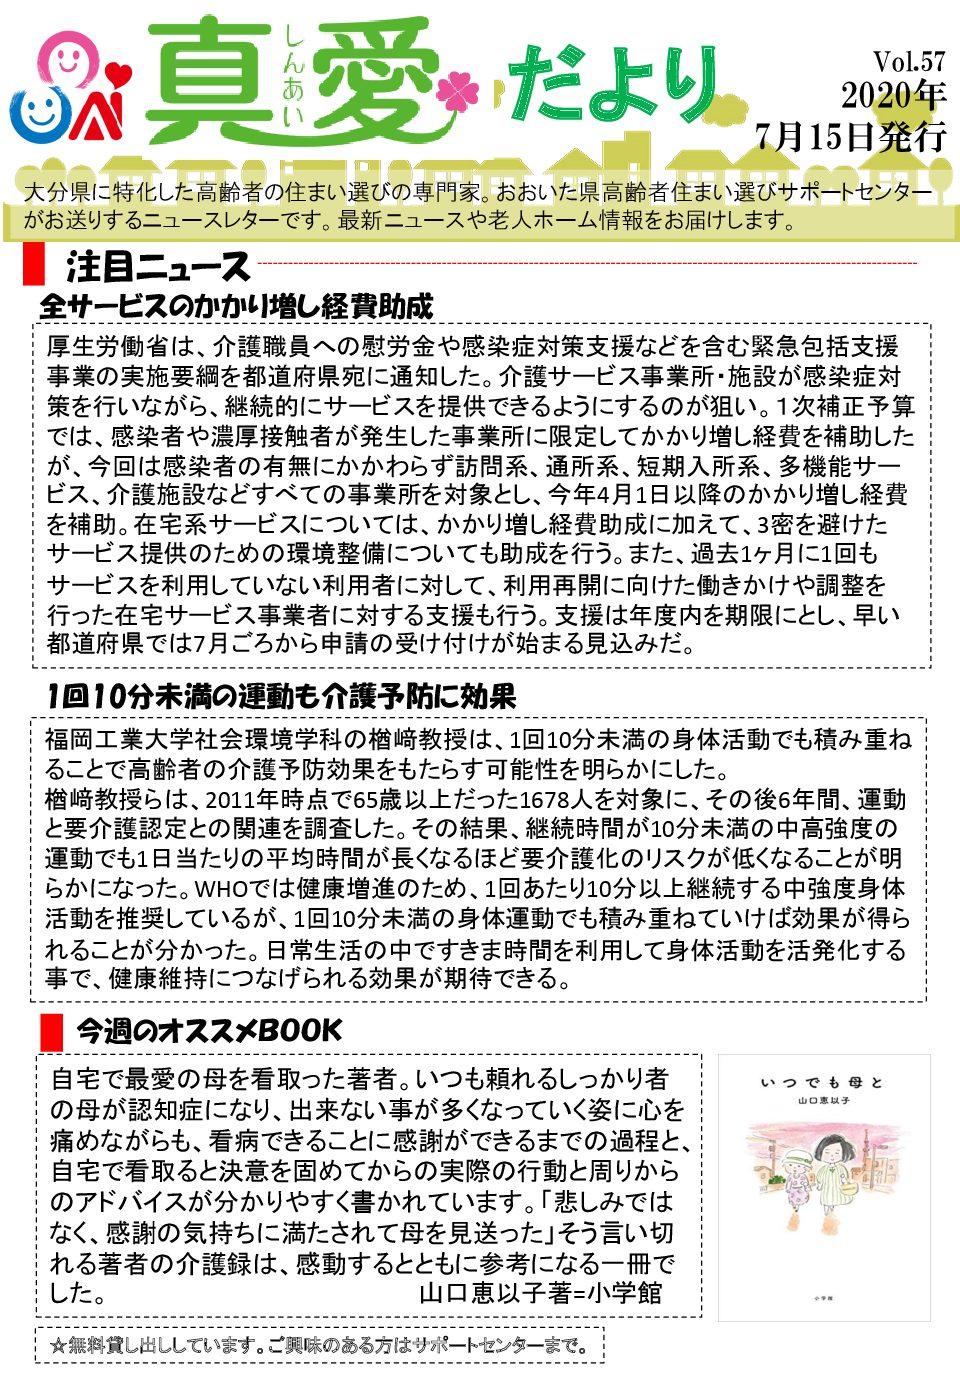 【Vol.57】 2020.07.15発行